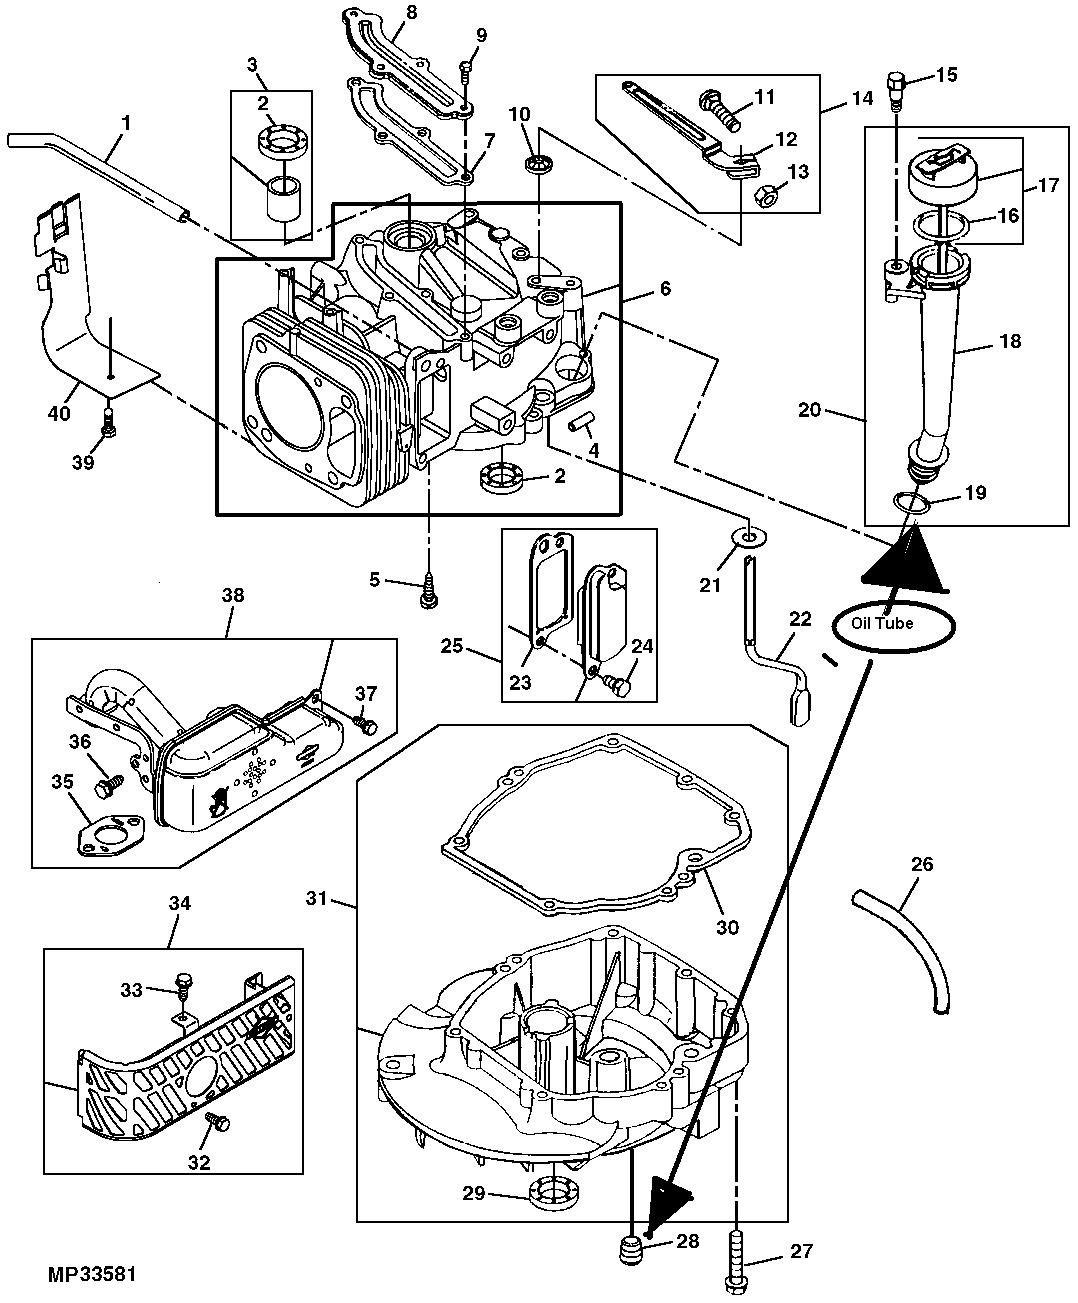 walker mower wiring diagram  walker  free engine image for